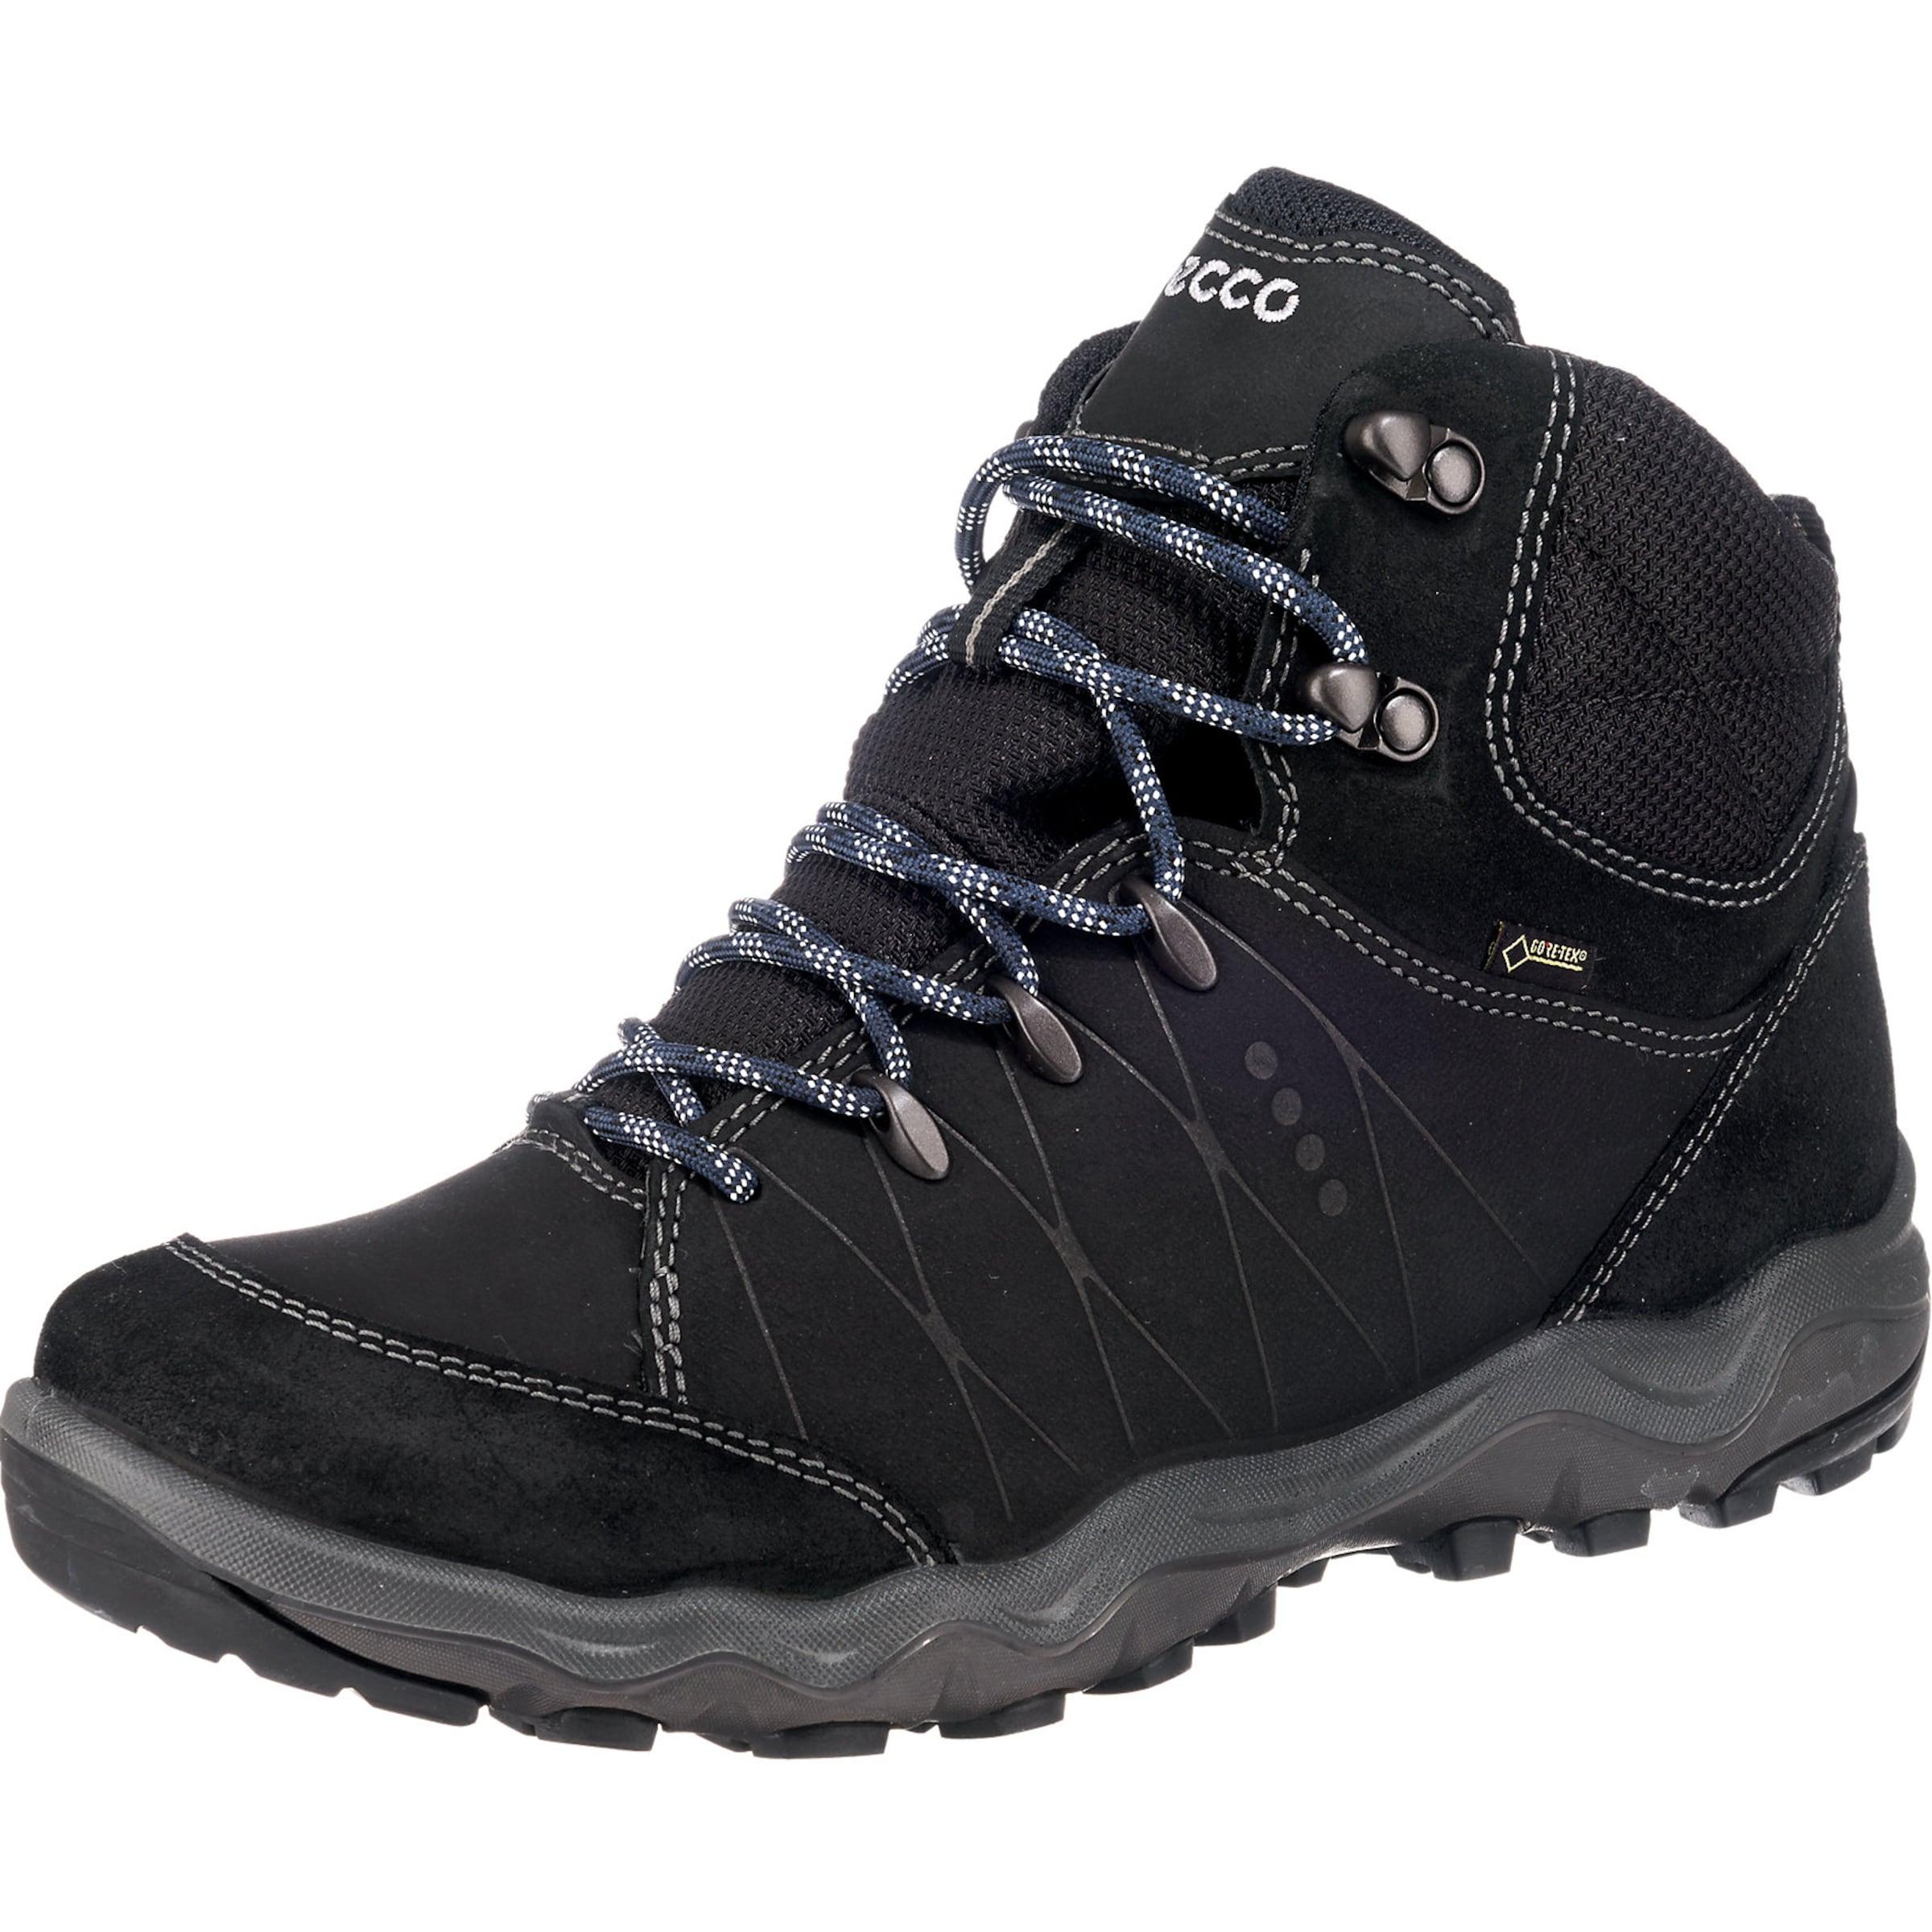 ECCO | Ulterra Stiefel & Stiefeletten Schuhe Gut getragene Schuhe